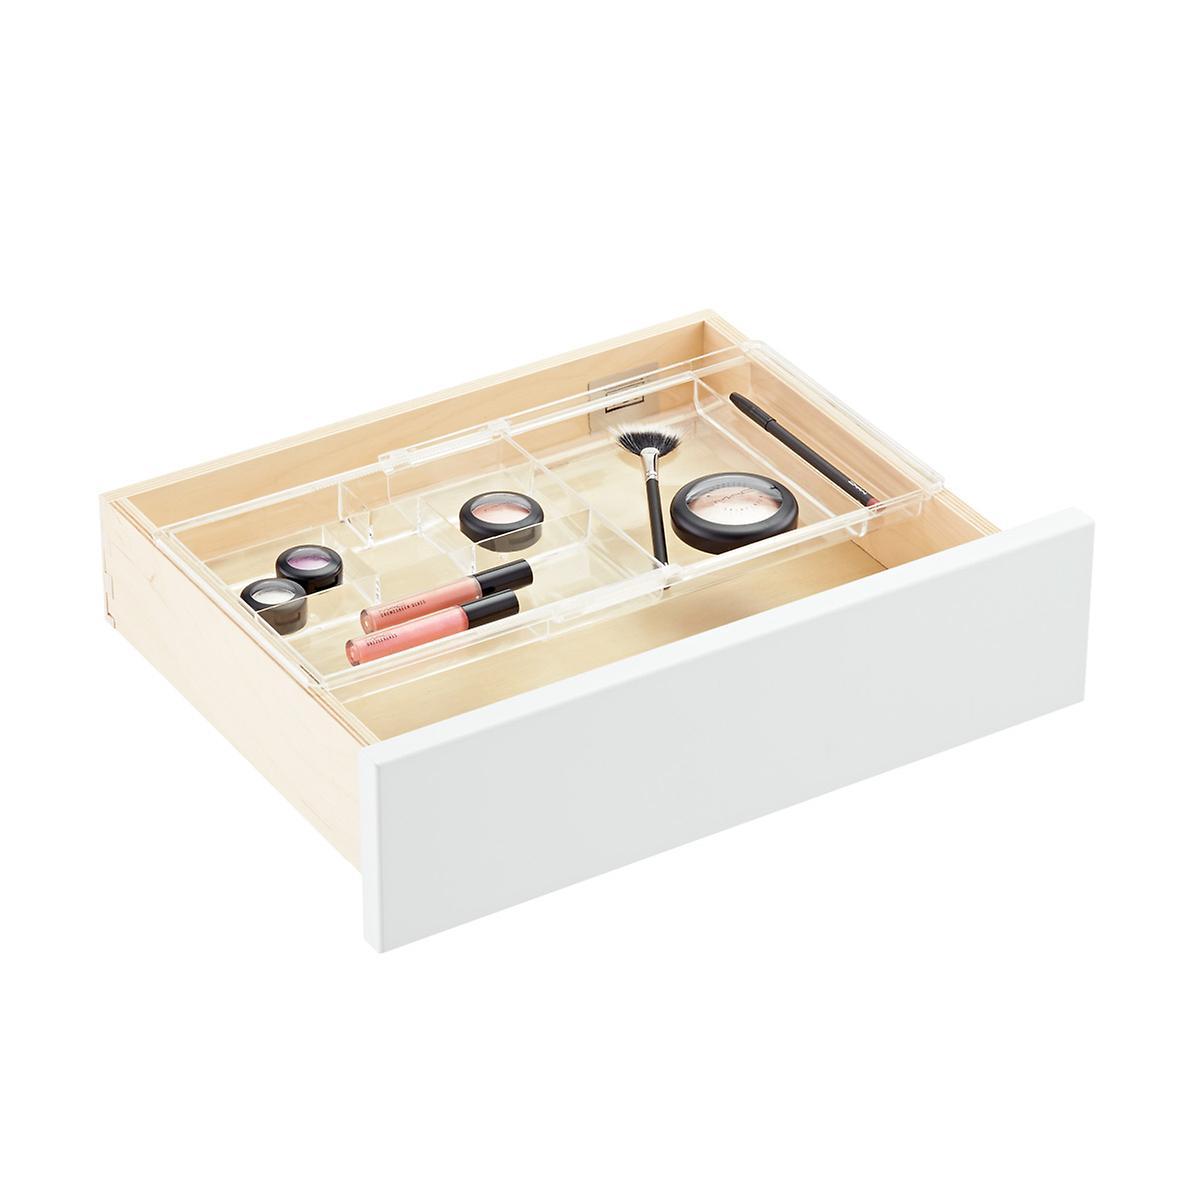 Acrylic Drawer Doubler